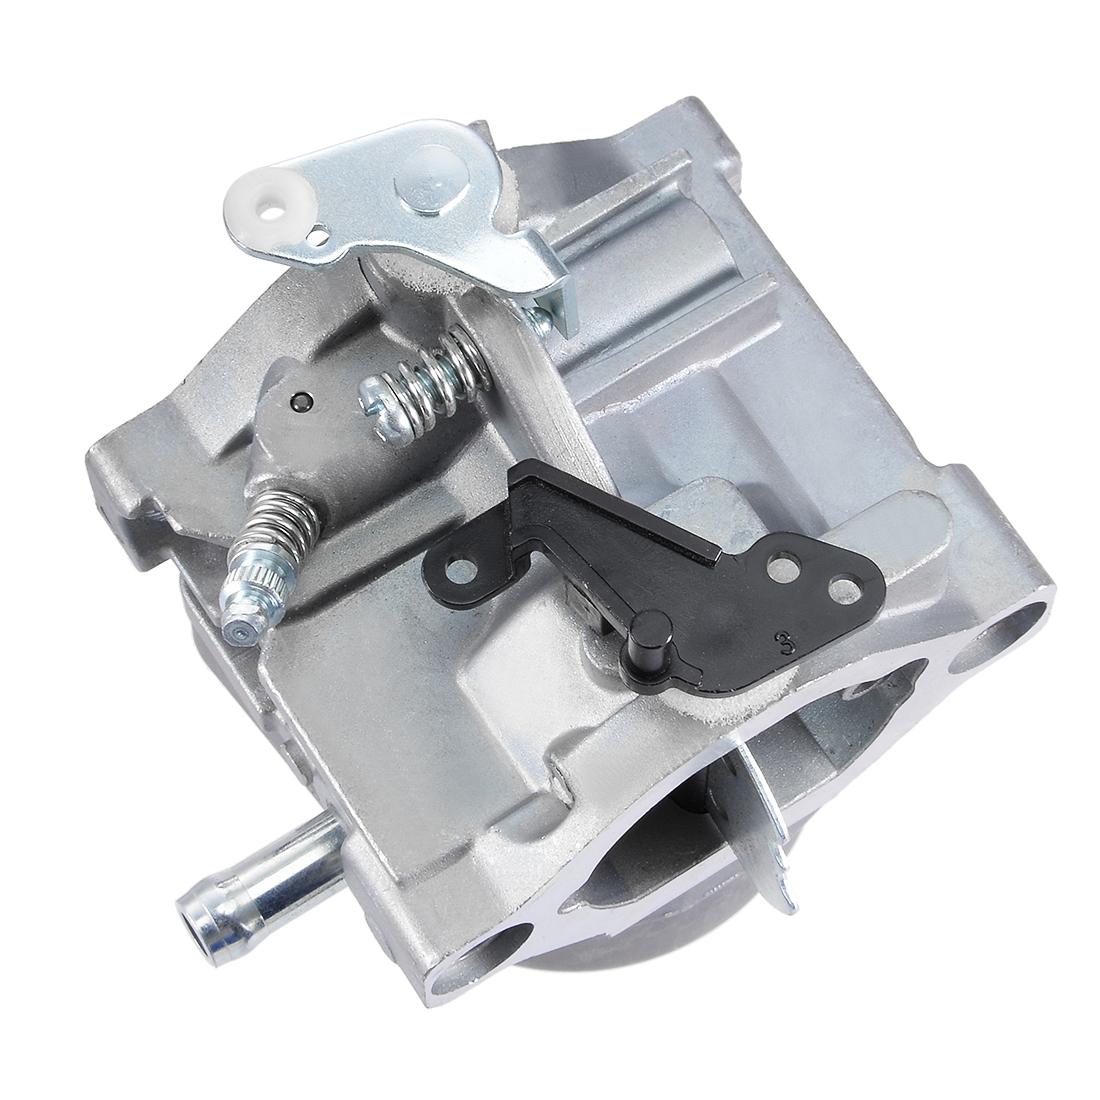 Unique Bargains Carburetor Kit Replaces Briggs & Stratton 794572 791858 792358 Intek 14HP 18HP - image 3 of 7